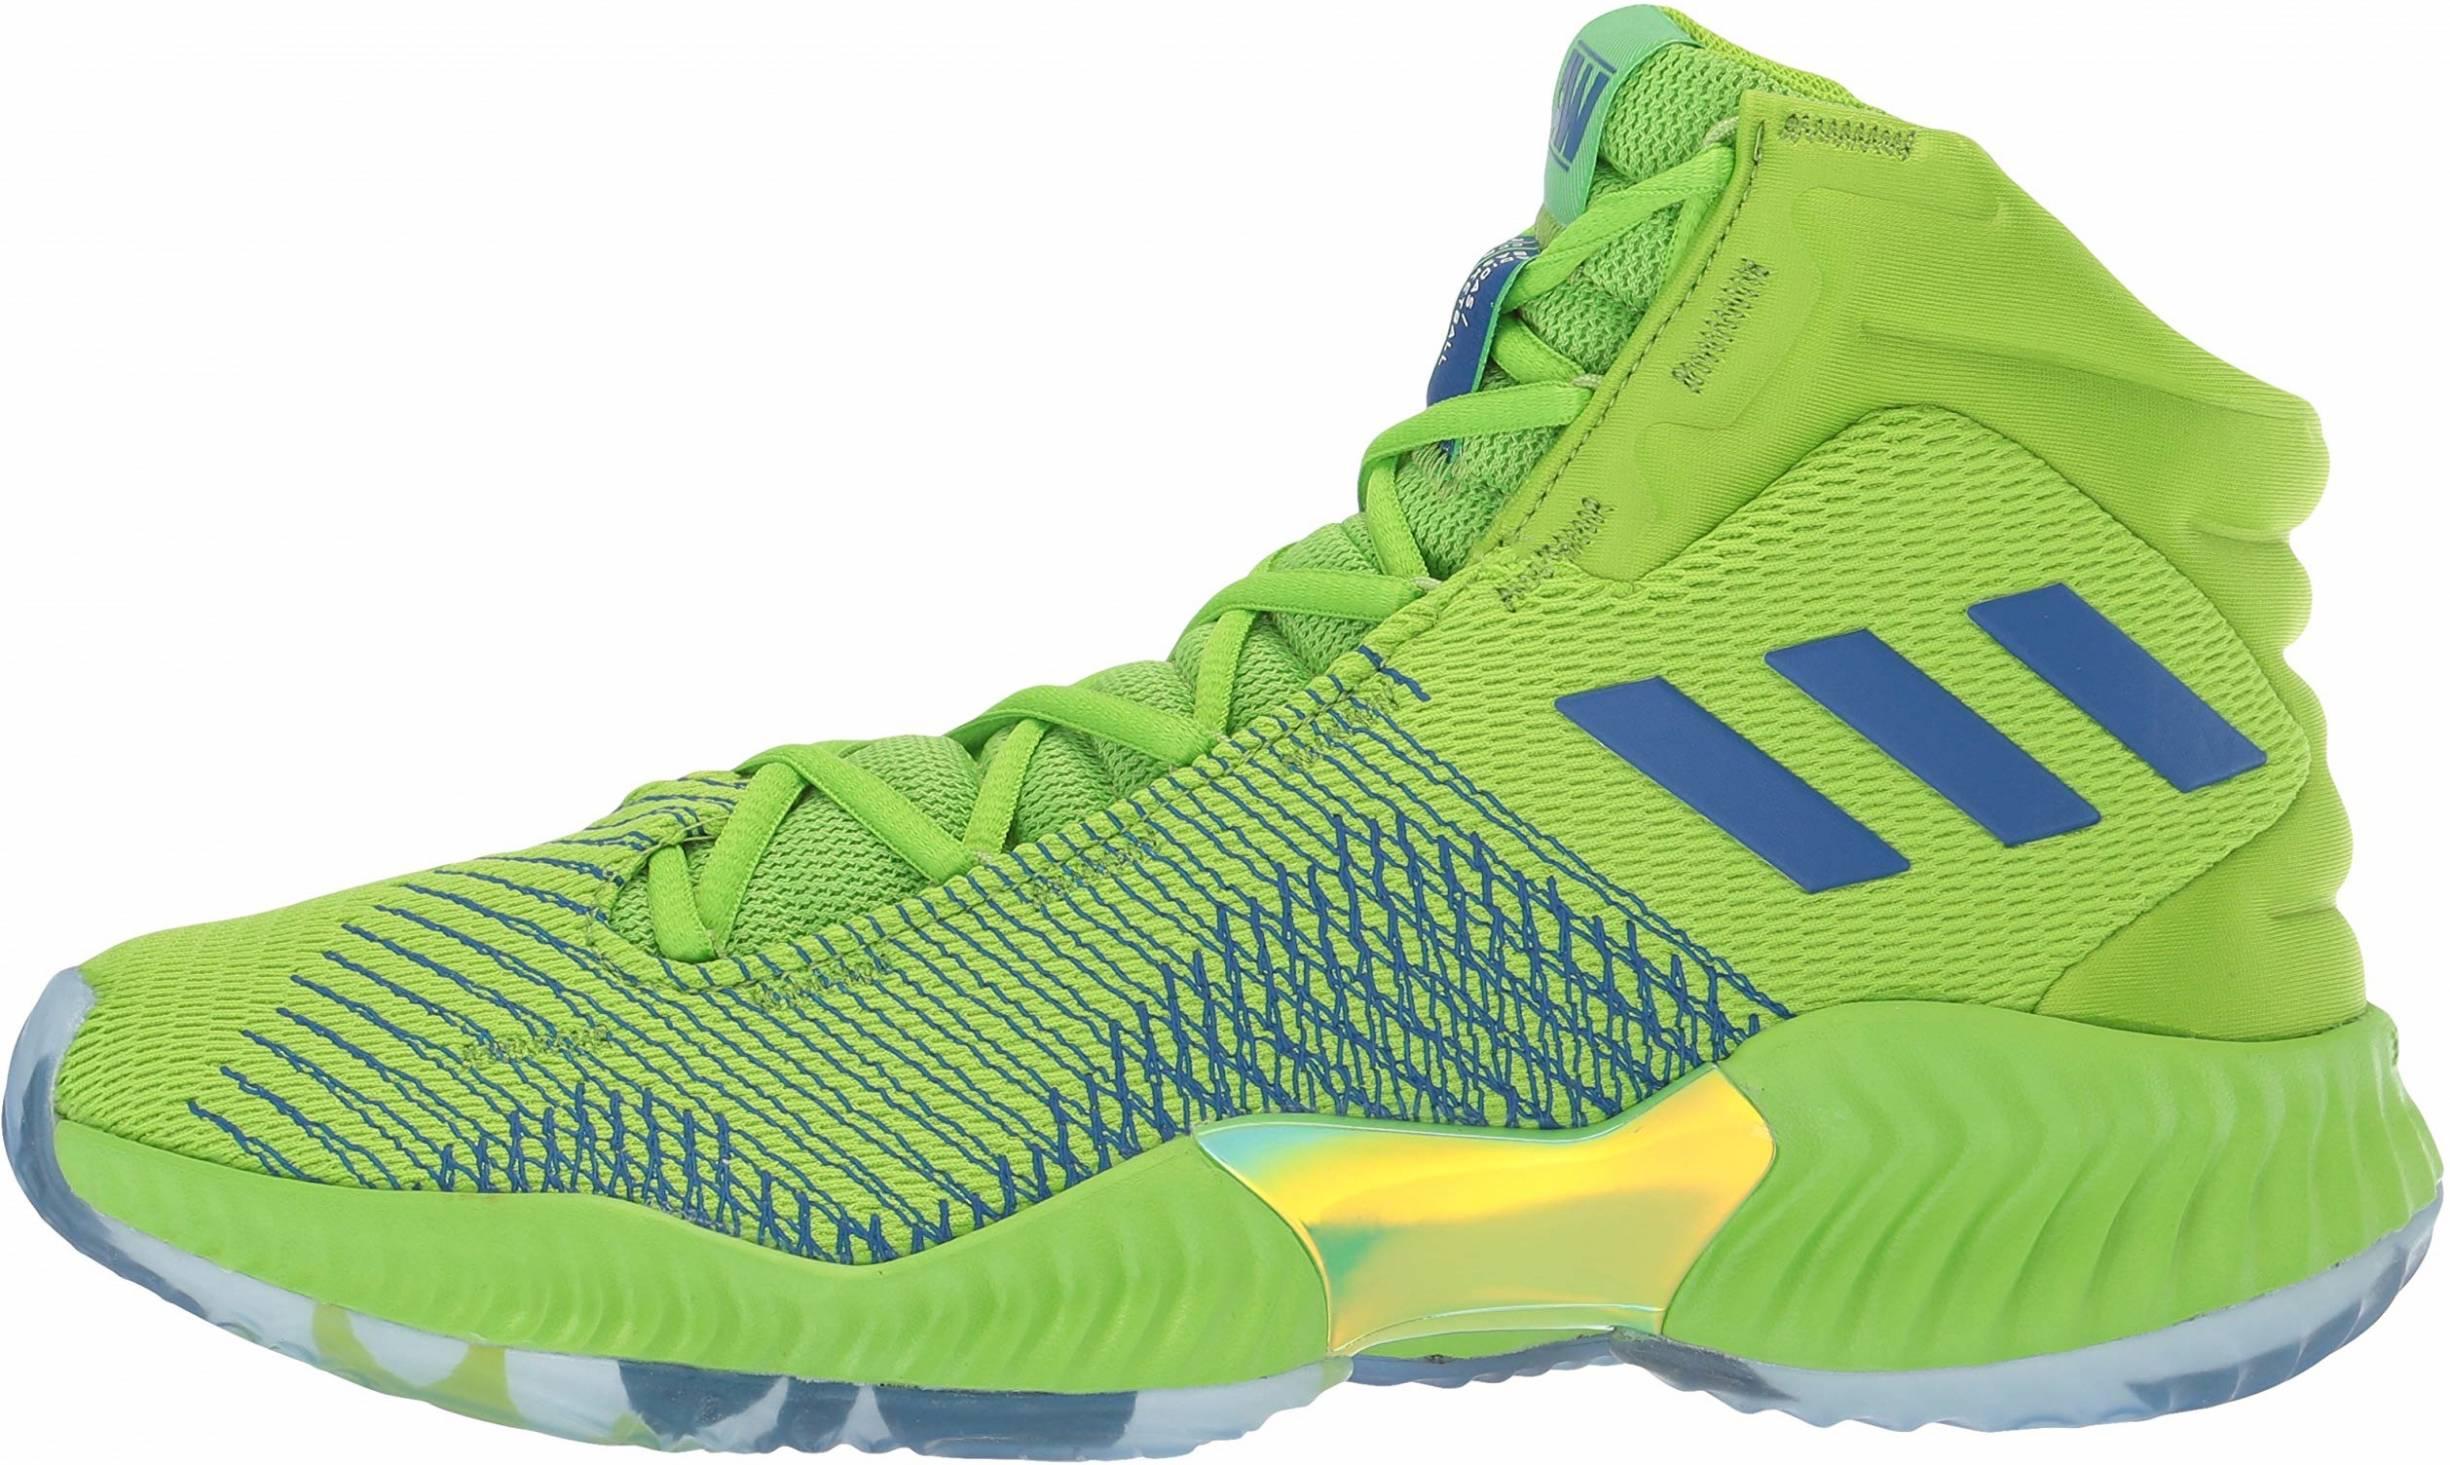 Save 31% on Green Basketball Shoes (48